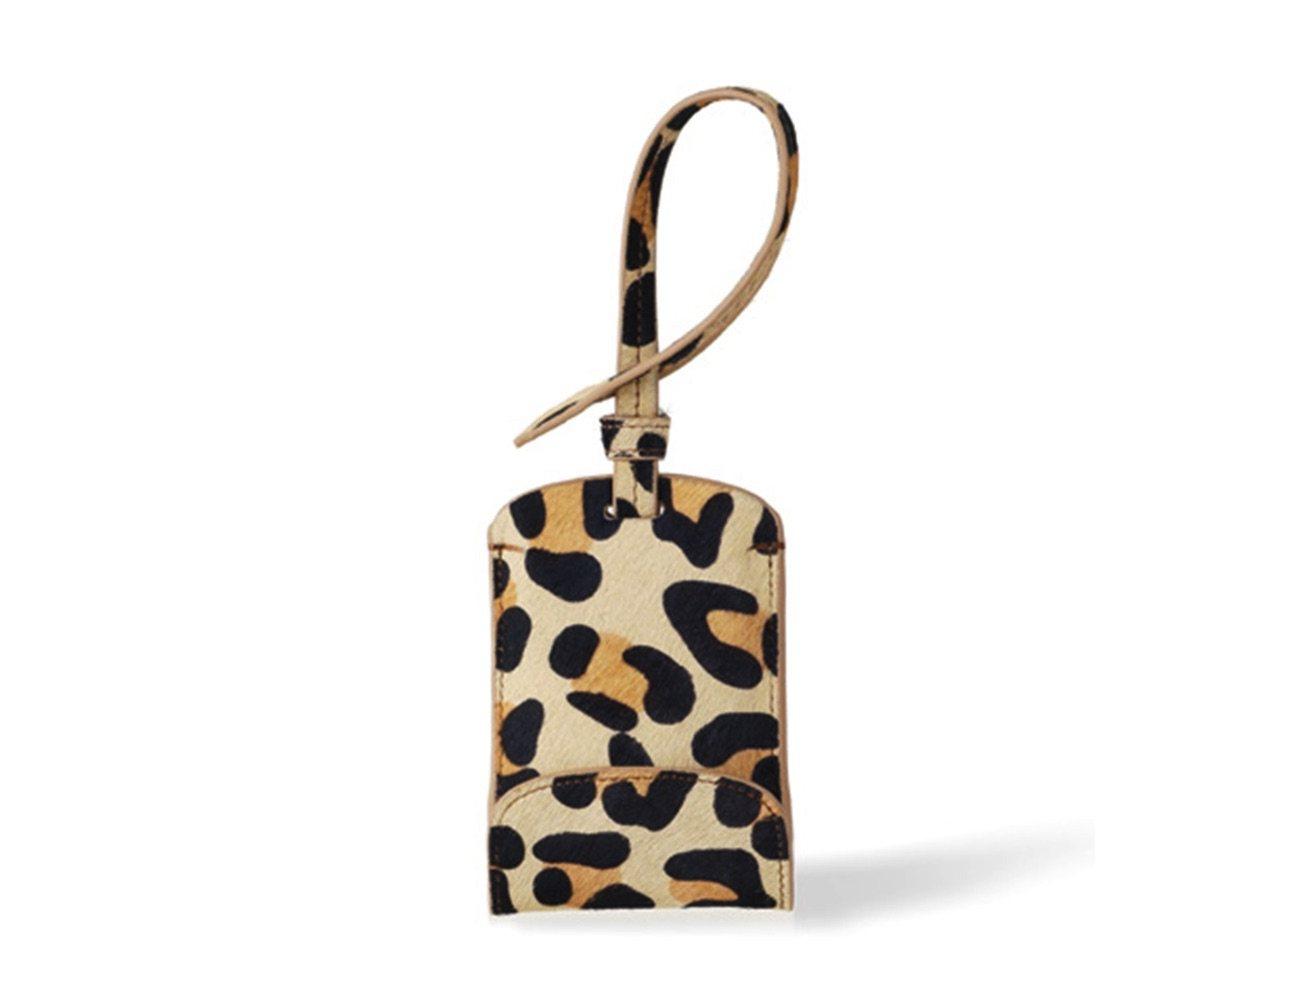 Leopard Bag Tag Smartphone Charger